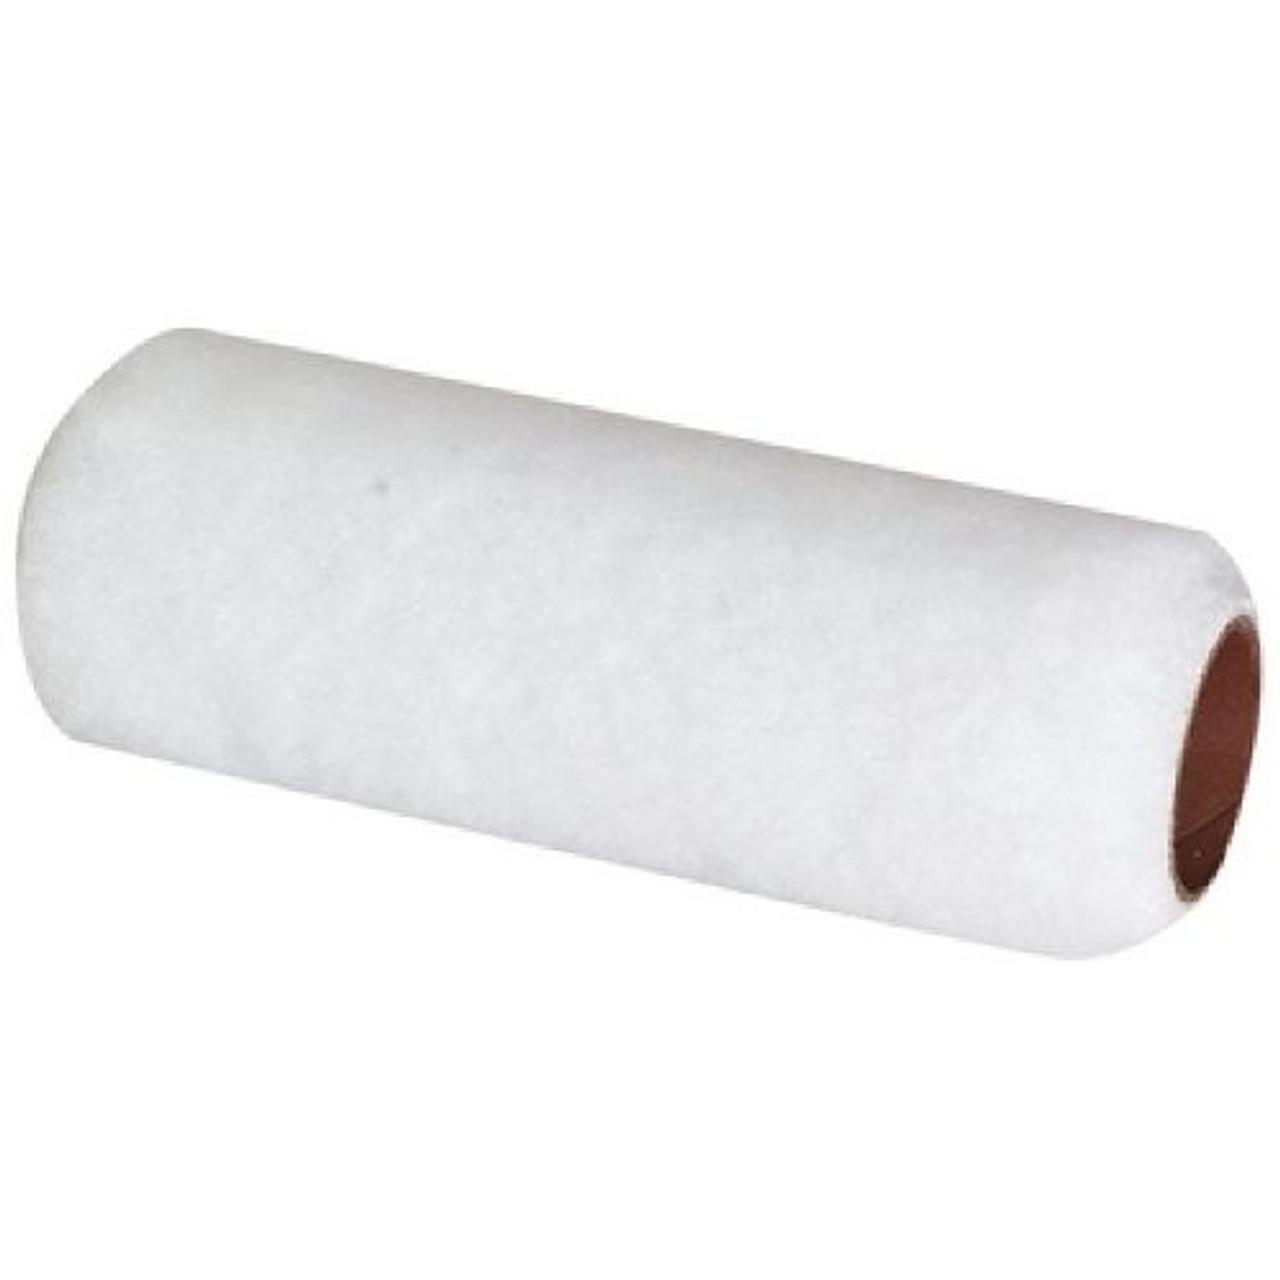 Seachoice 9 Inch Polyester Paint Roller - Best for Fiberglass Resins or Bottom Paint